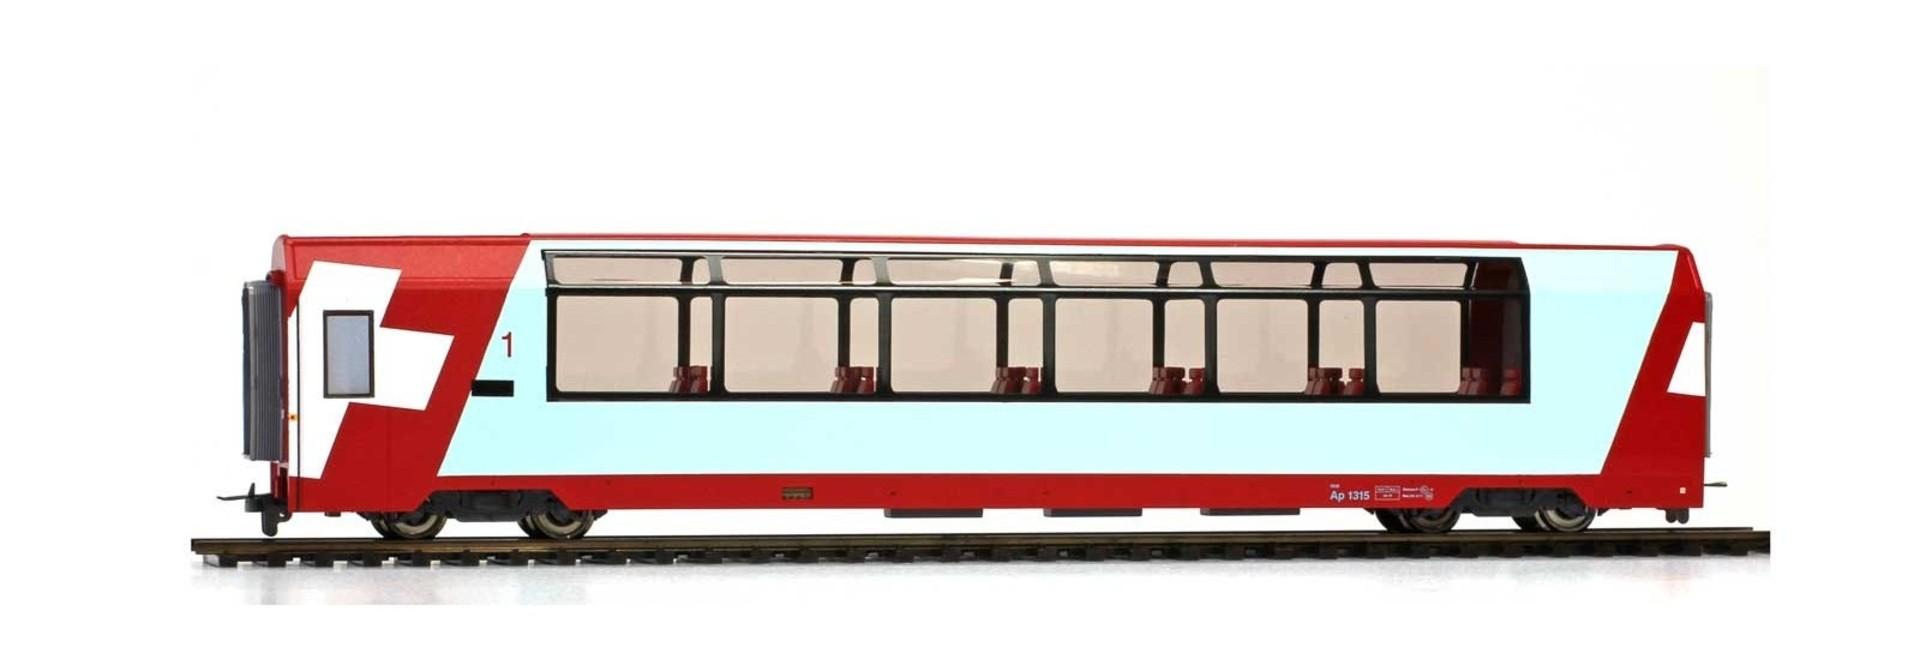 "3689102 RhB Api 1312 ""Glacier Express"" H0 2L-GS"